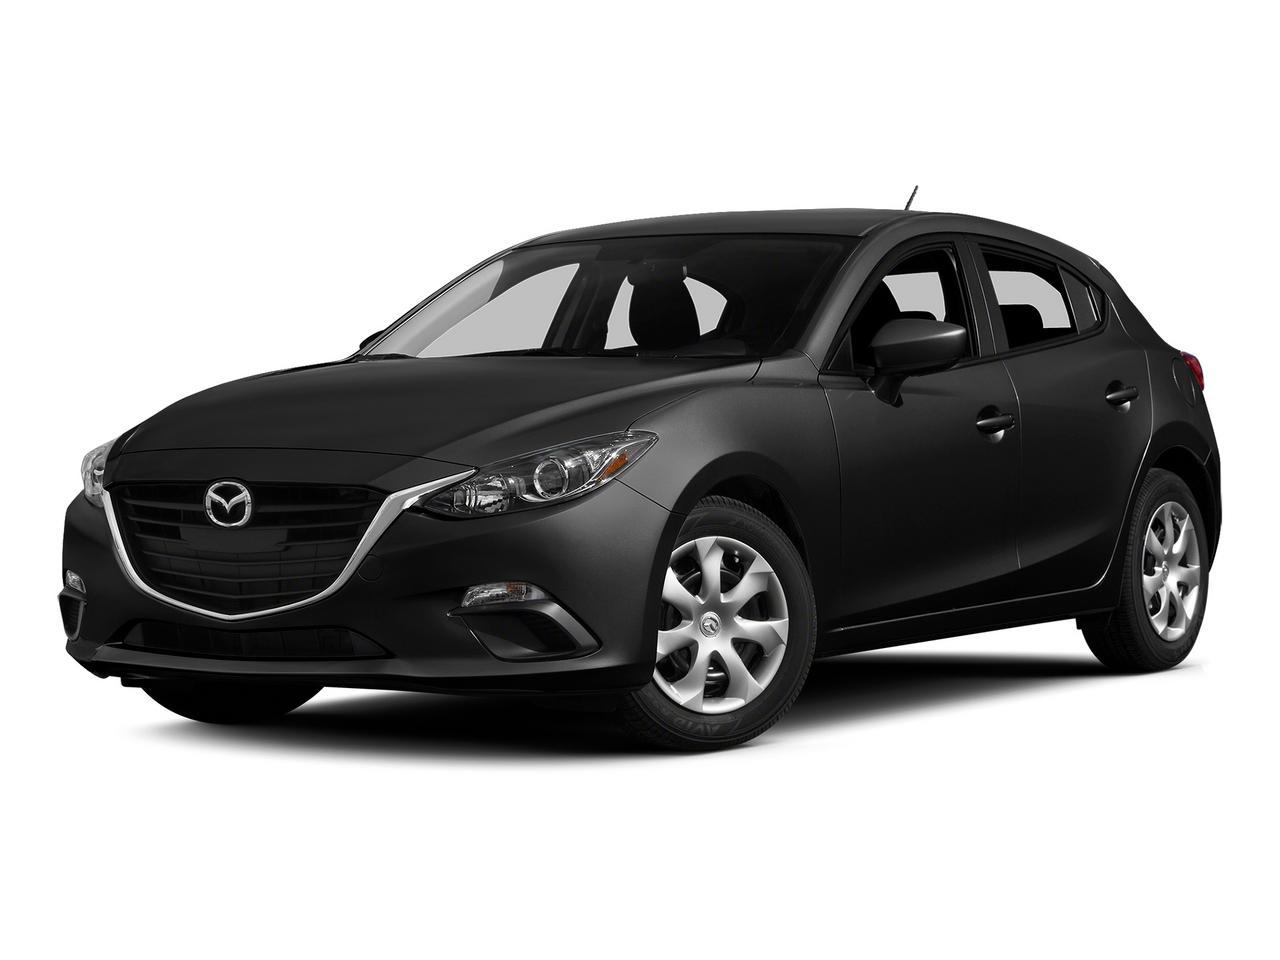 2015 Mazda Mazda3 Vehicle Photo in Killeen, TX 76541